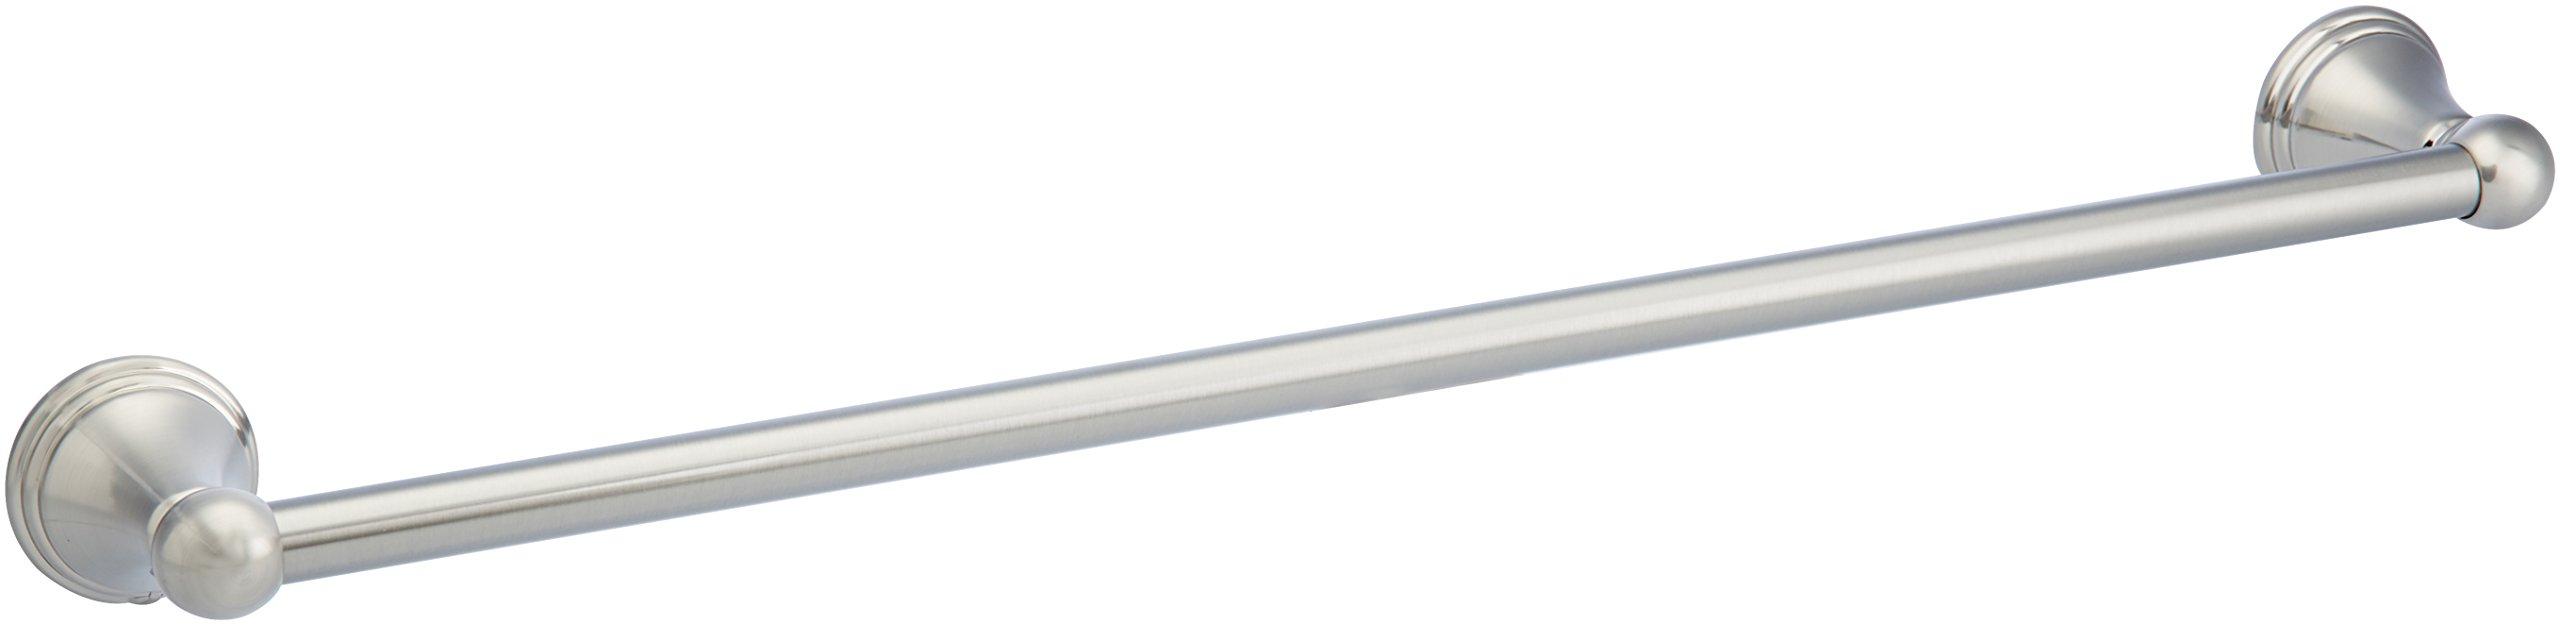 AmazonBasics AB-BR811-SN Towel Bar, 24 Inch, Satin Nickel by AmazonBasics